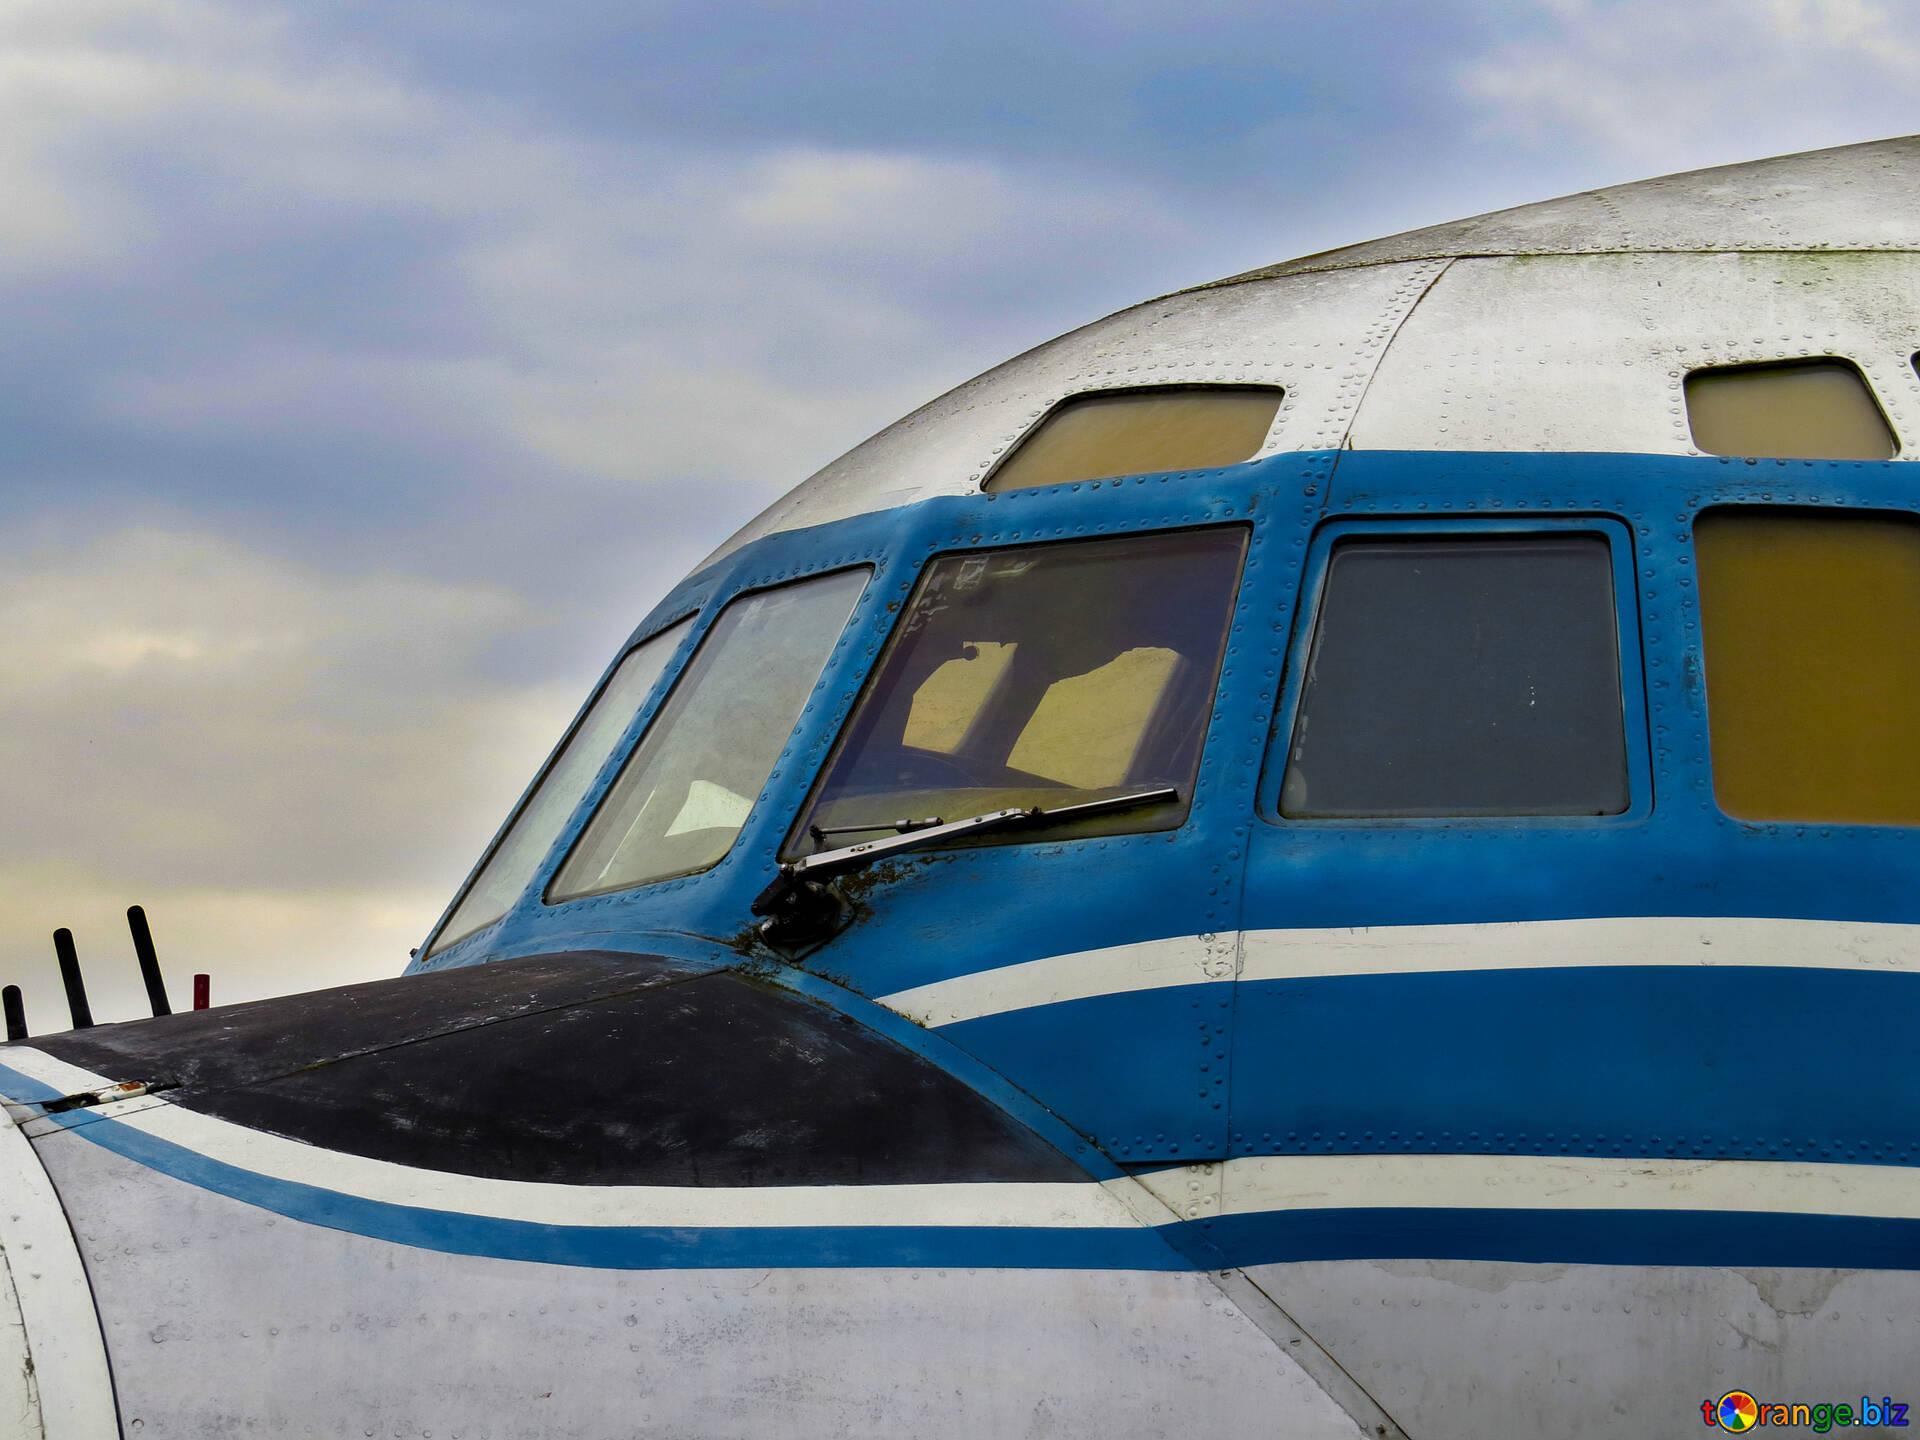 Older Aircraft Cab Old Plane Aviation 26429